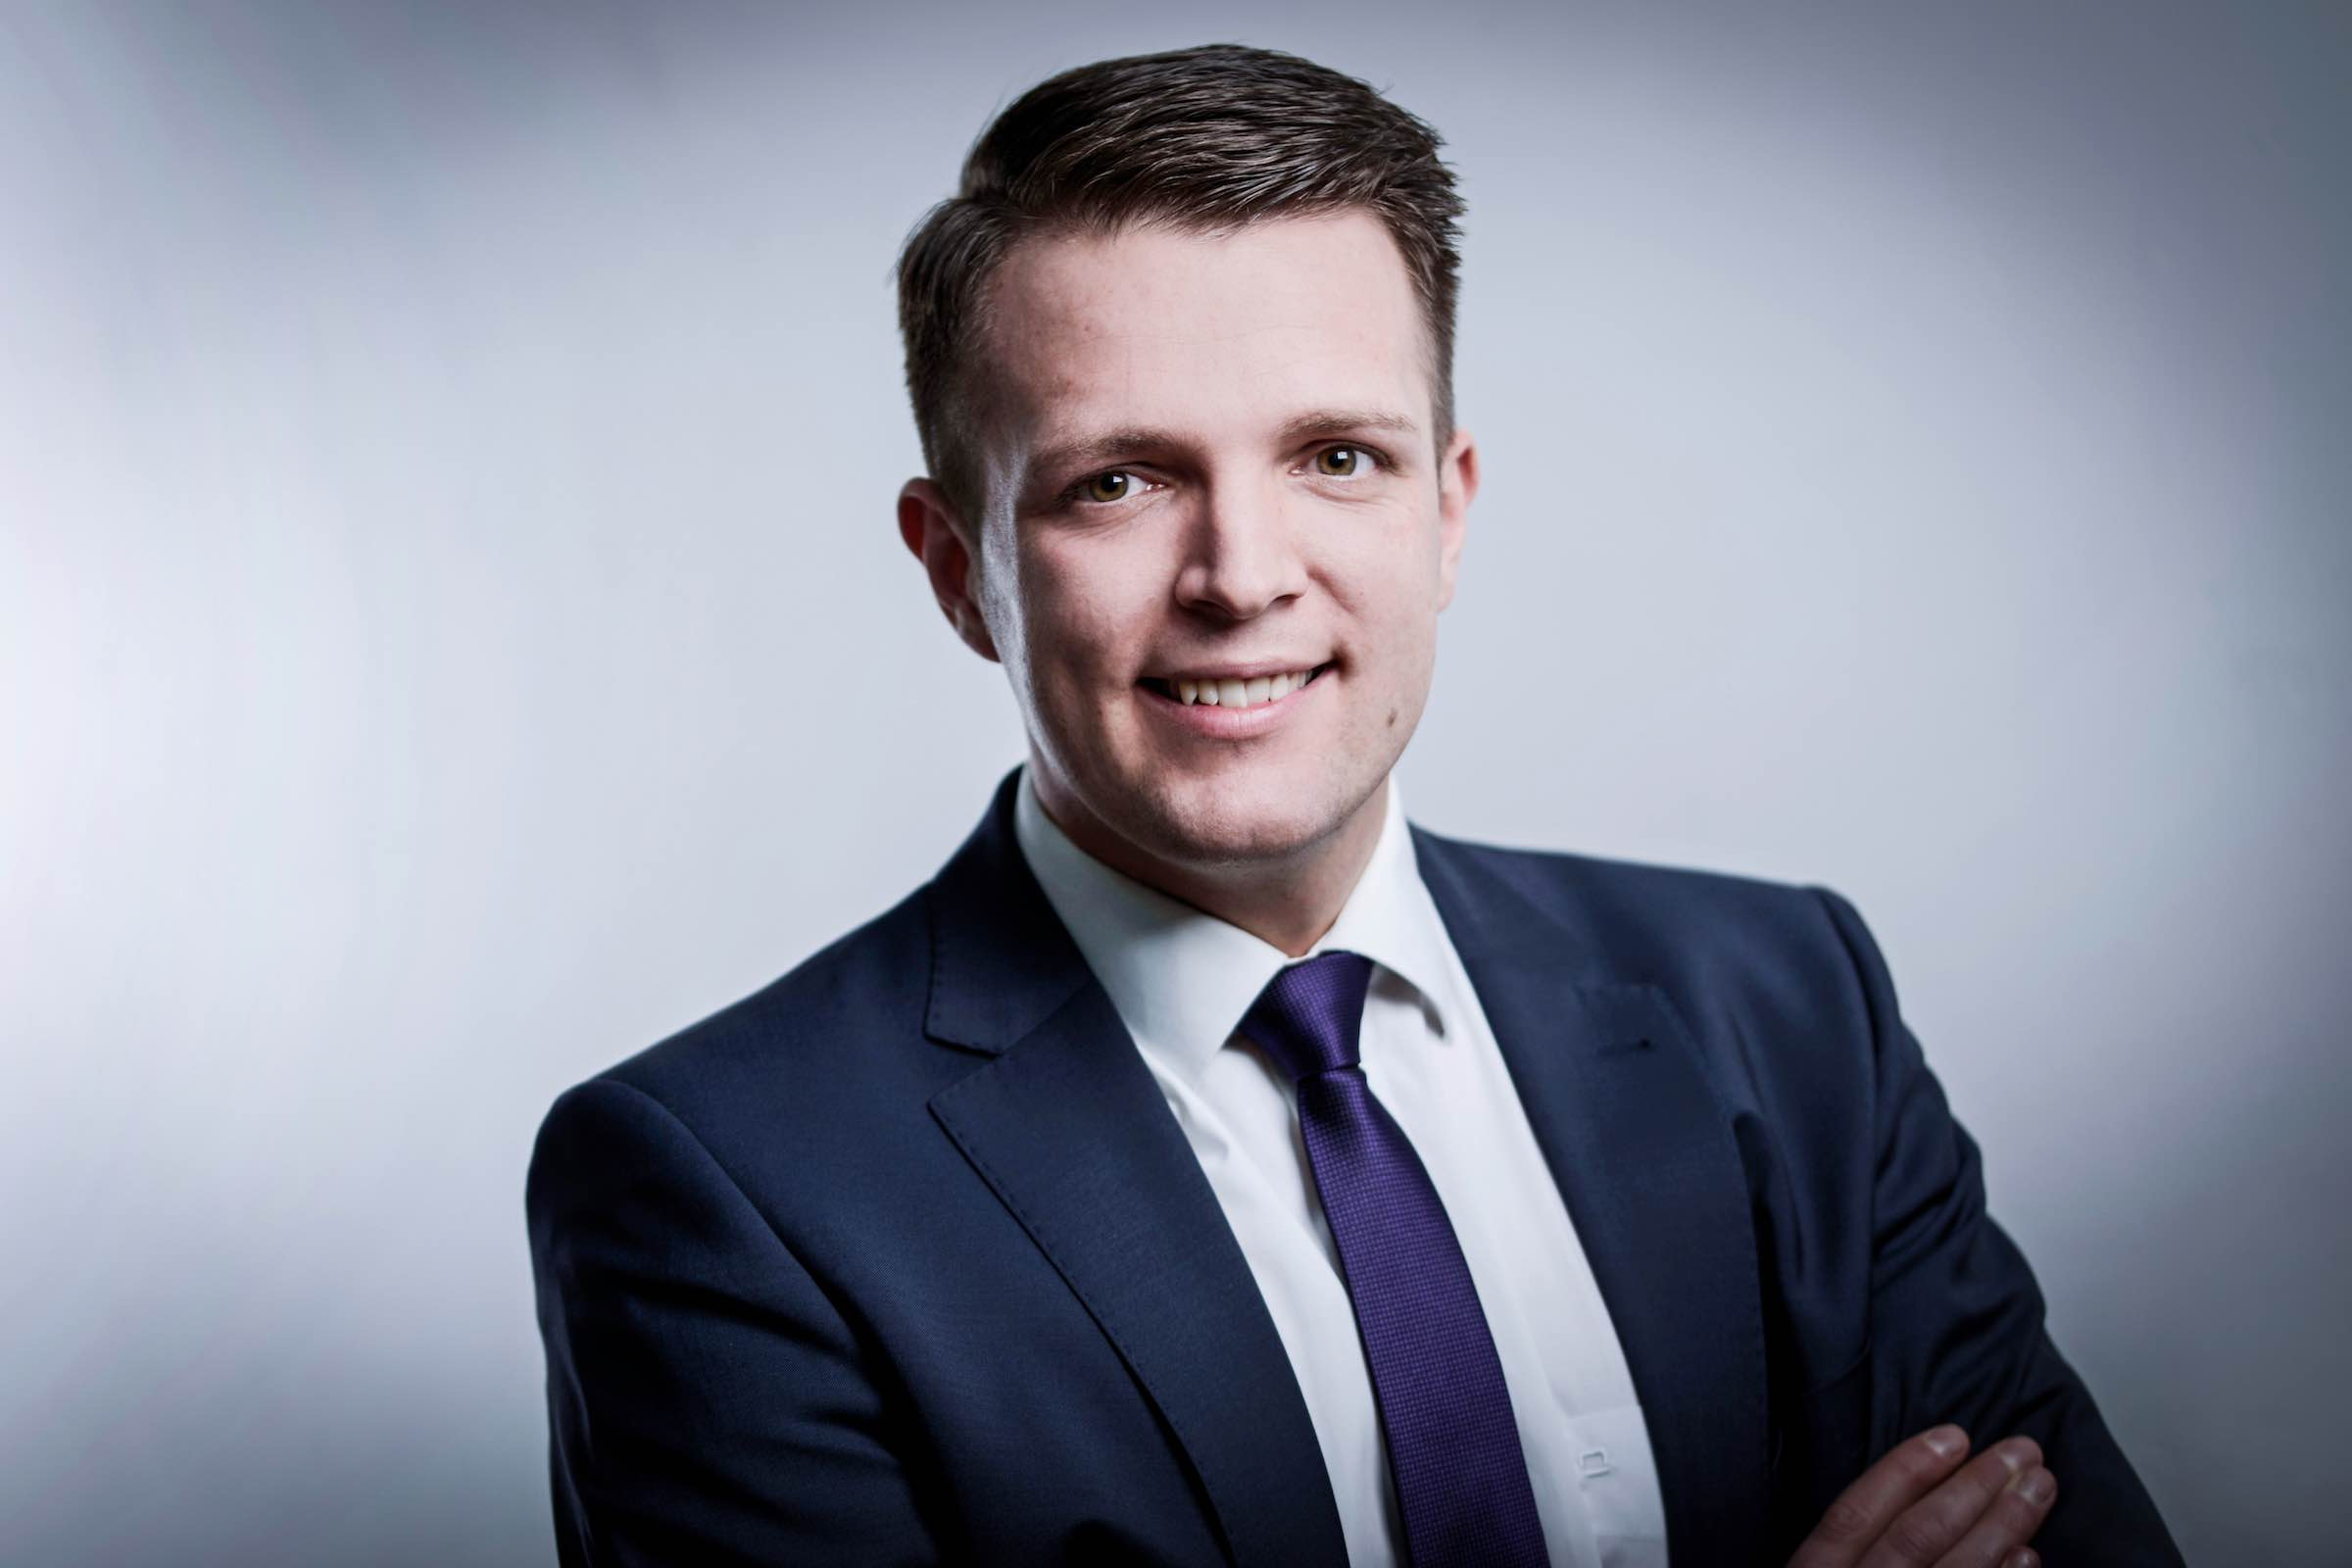 Geschäftsführer TL-Systems Hannover